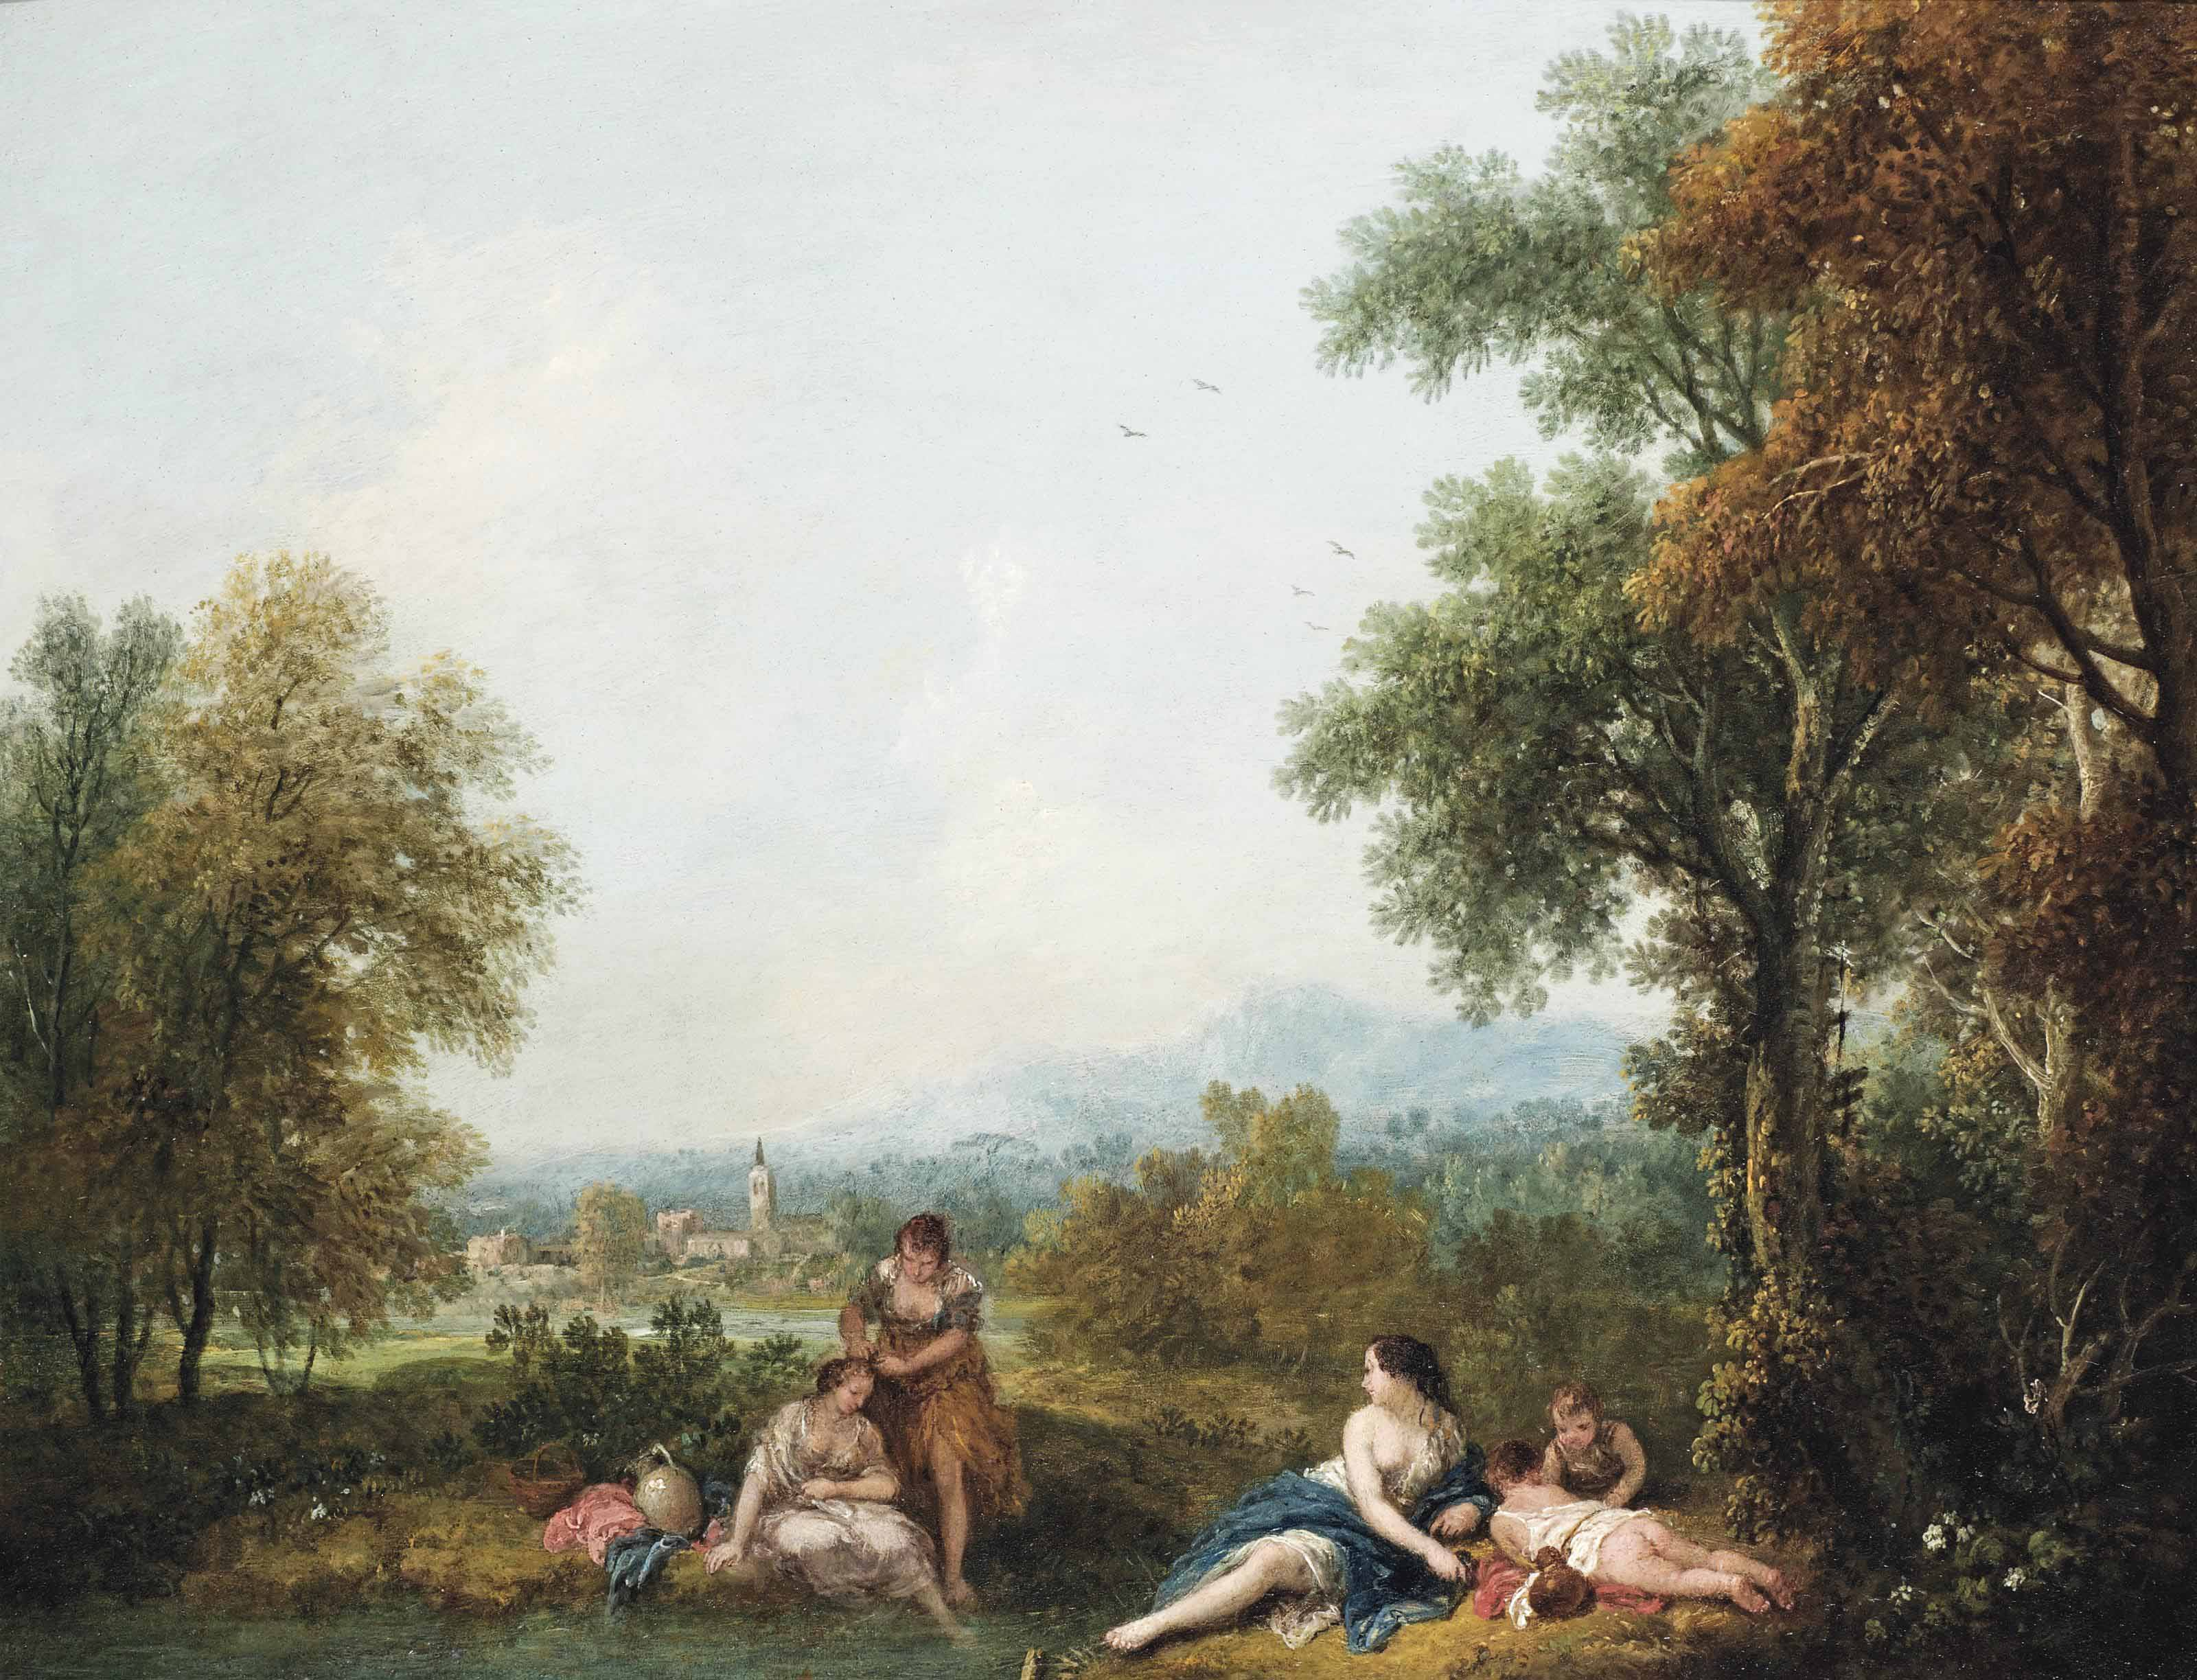 A pastoral river landscape with figures bathing